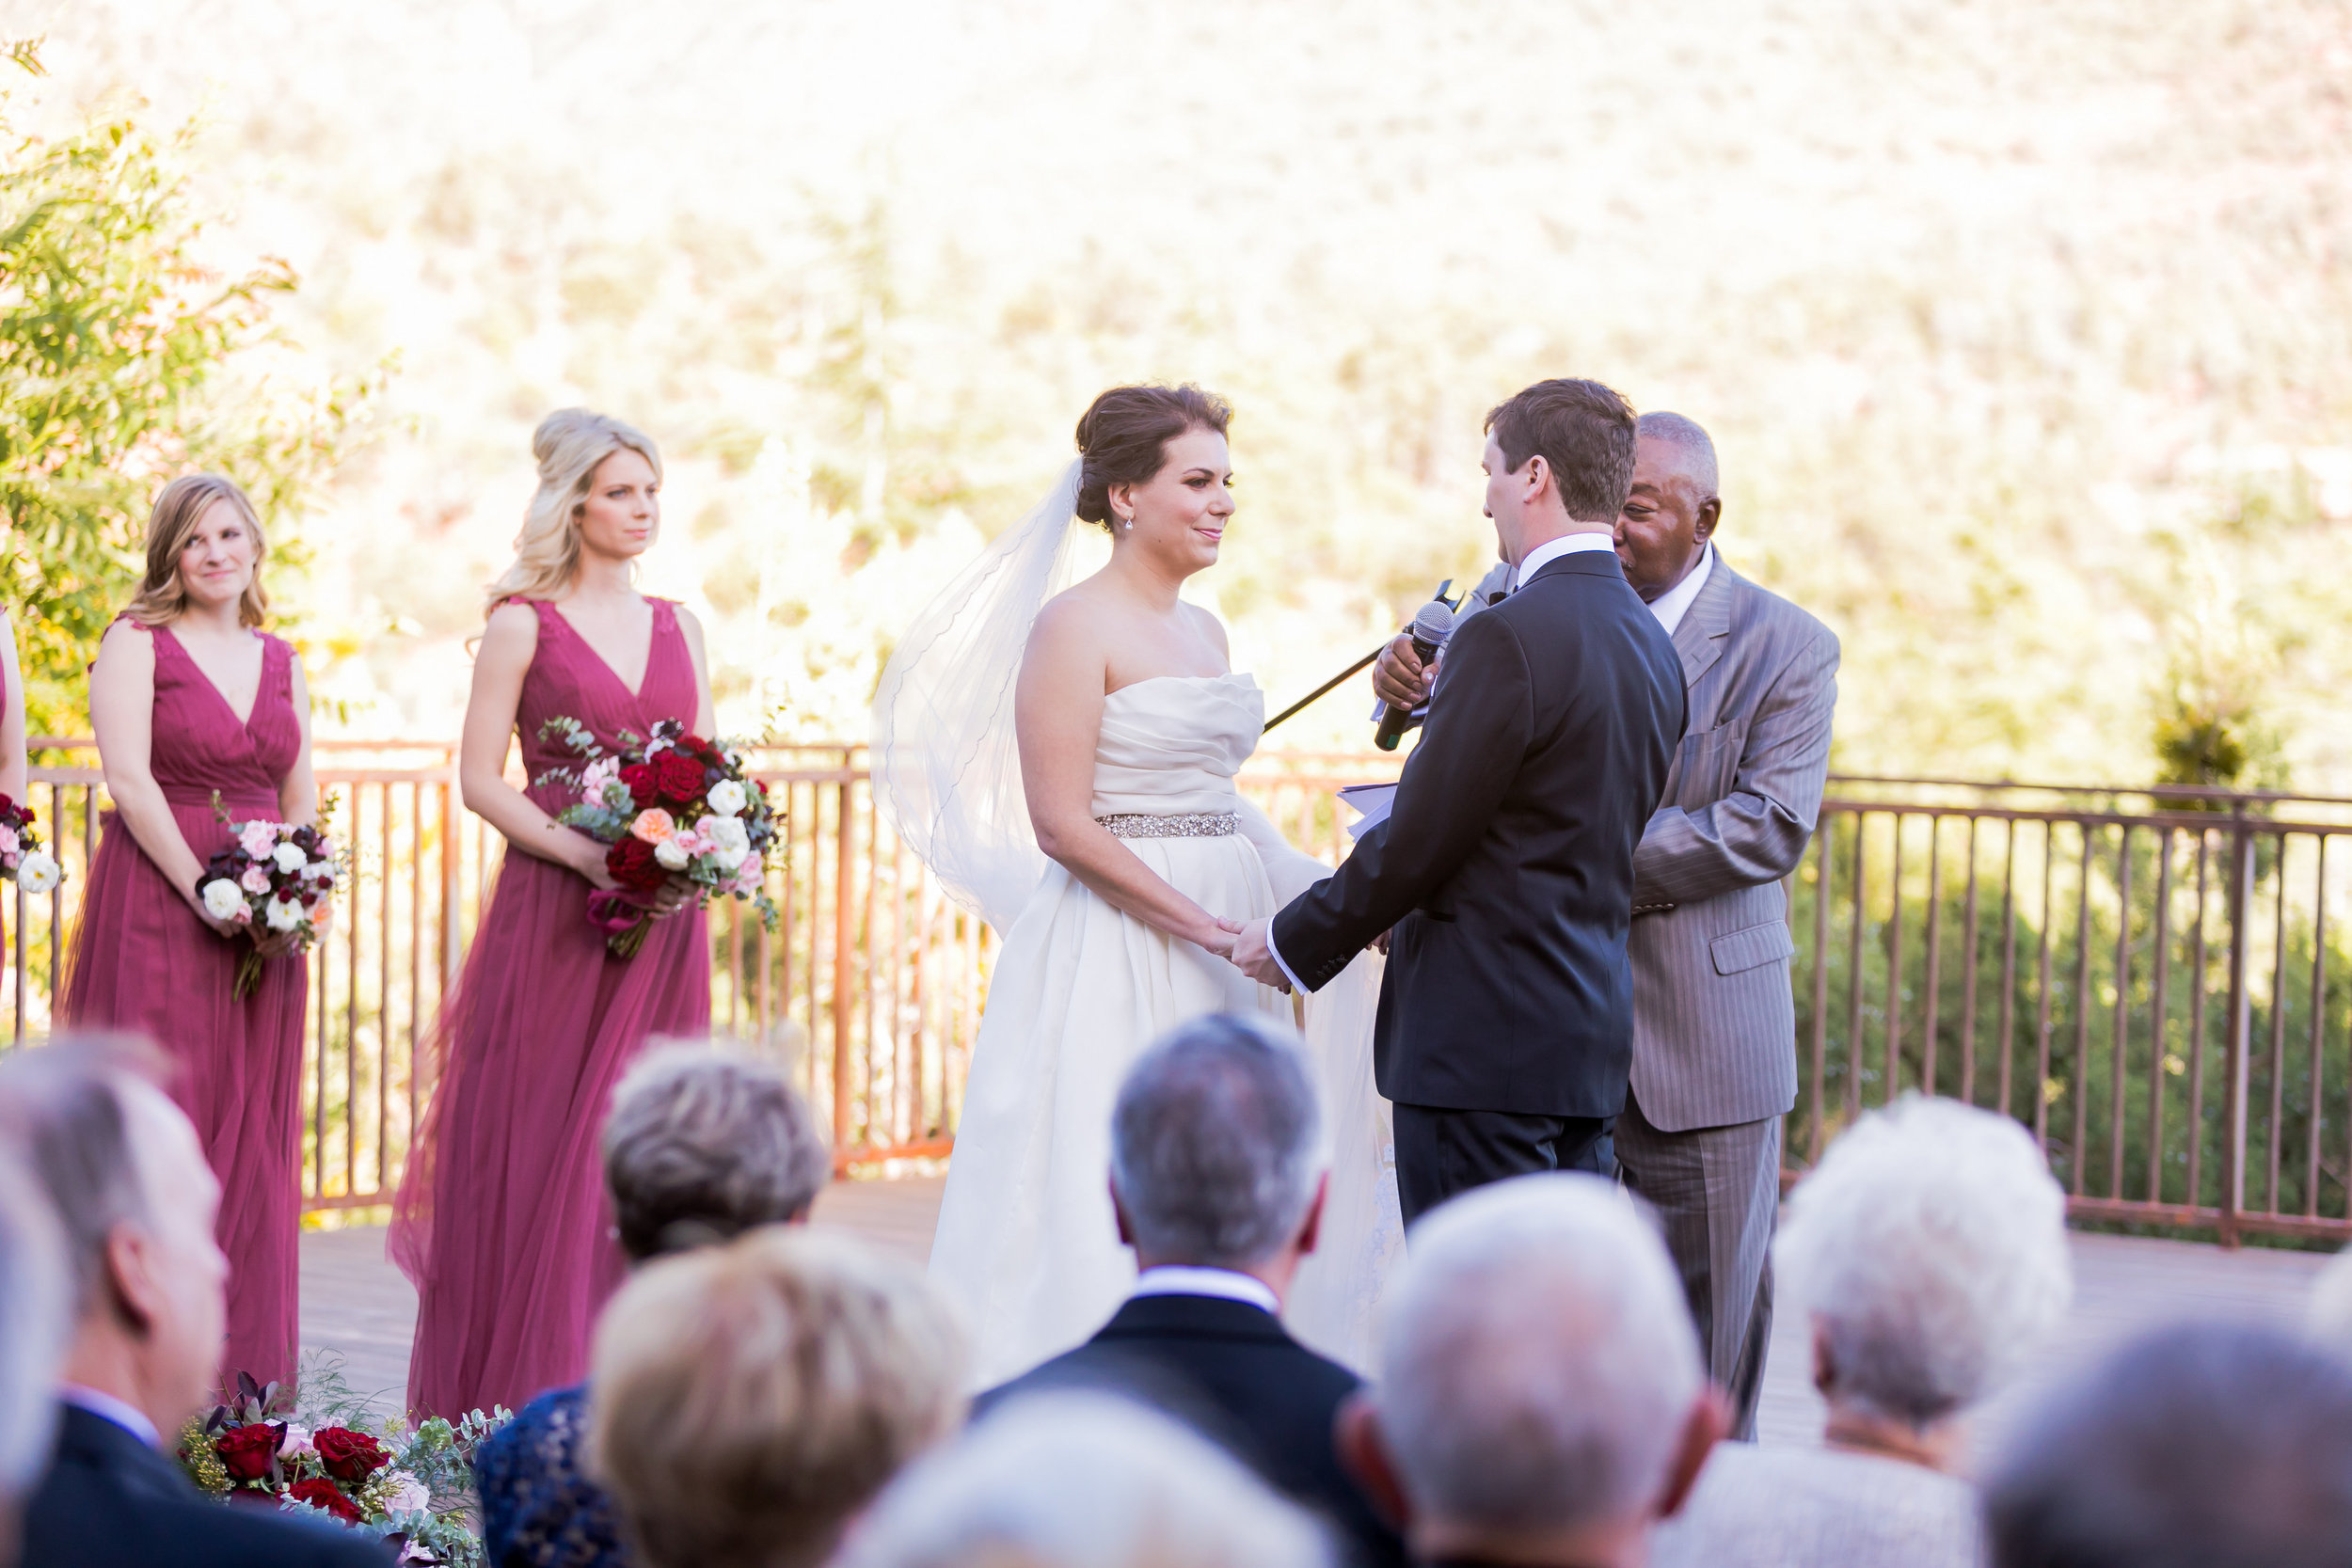 L'auberge de sedona - burgundy and blush wedding